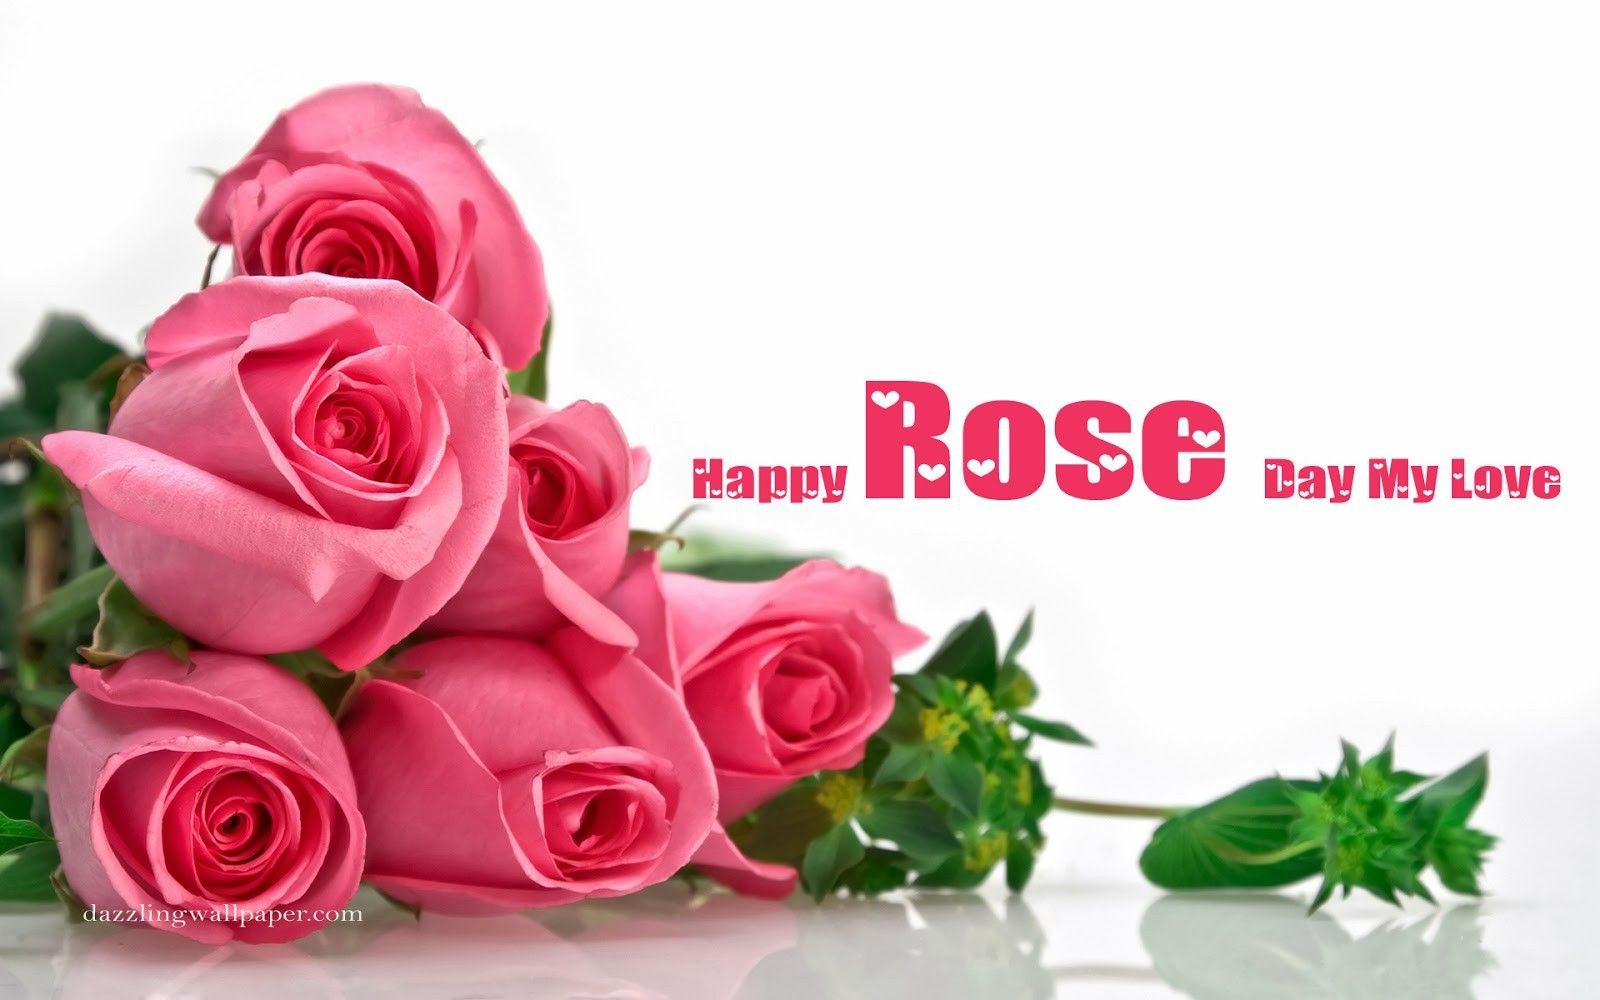 Rose Day Special Hd Wallpaper Pele Mele Wallpaper Wallpaper